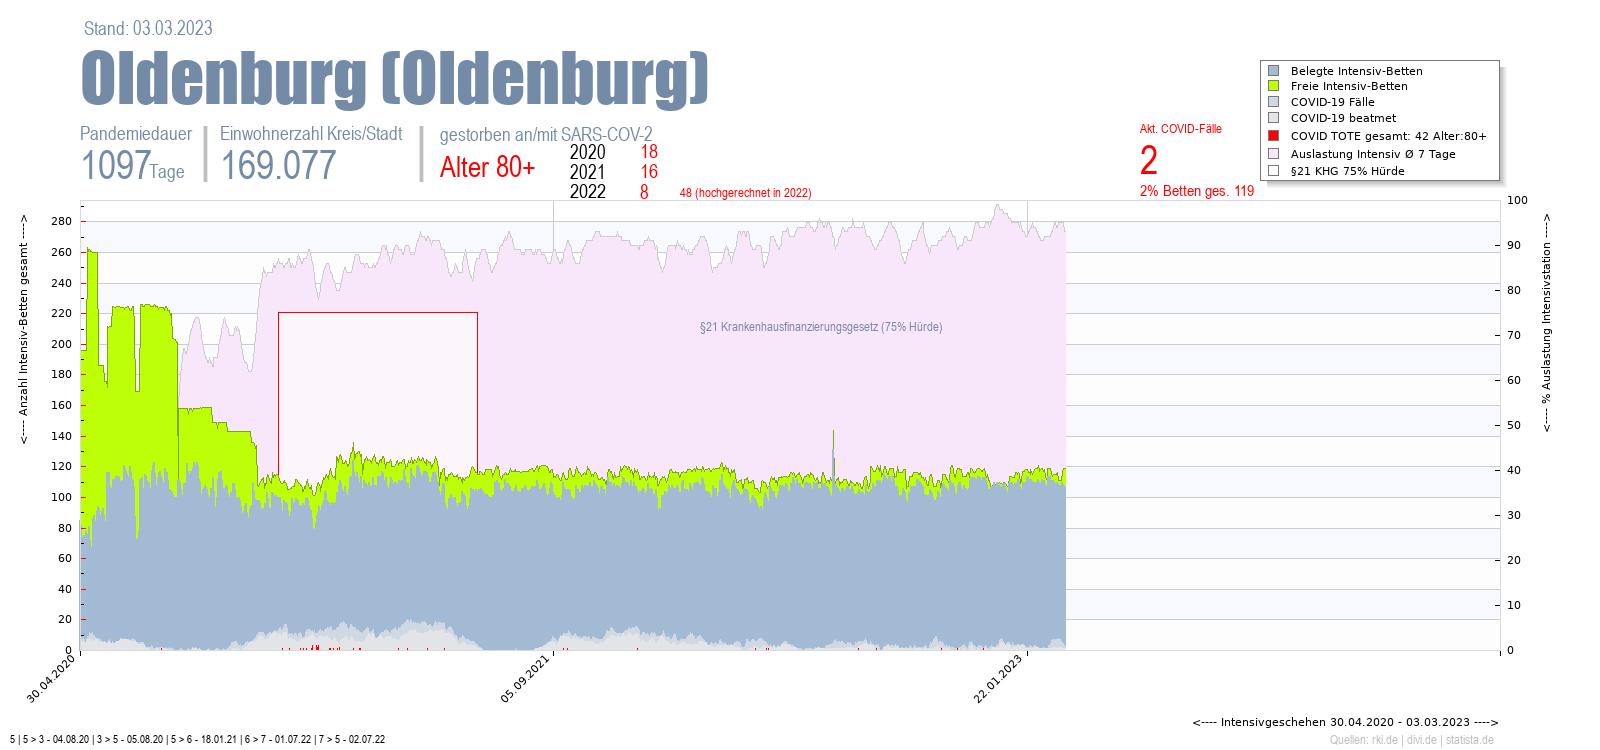 Intensivstation Auslastung Oldenburg (Oldenburg) Alter 0-4